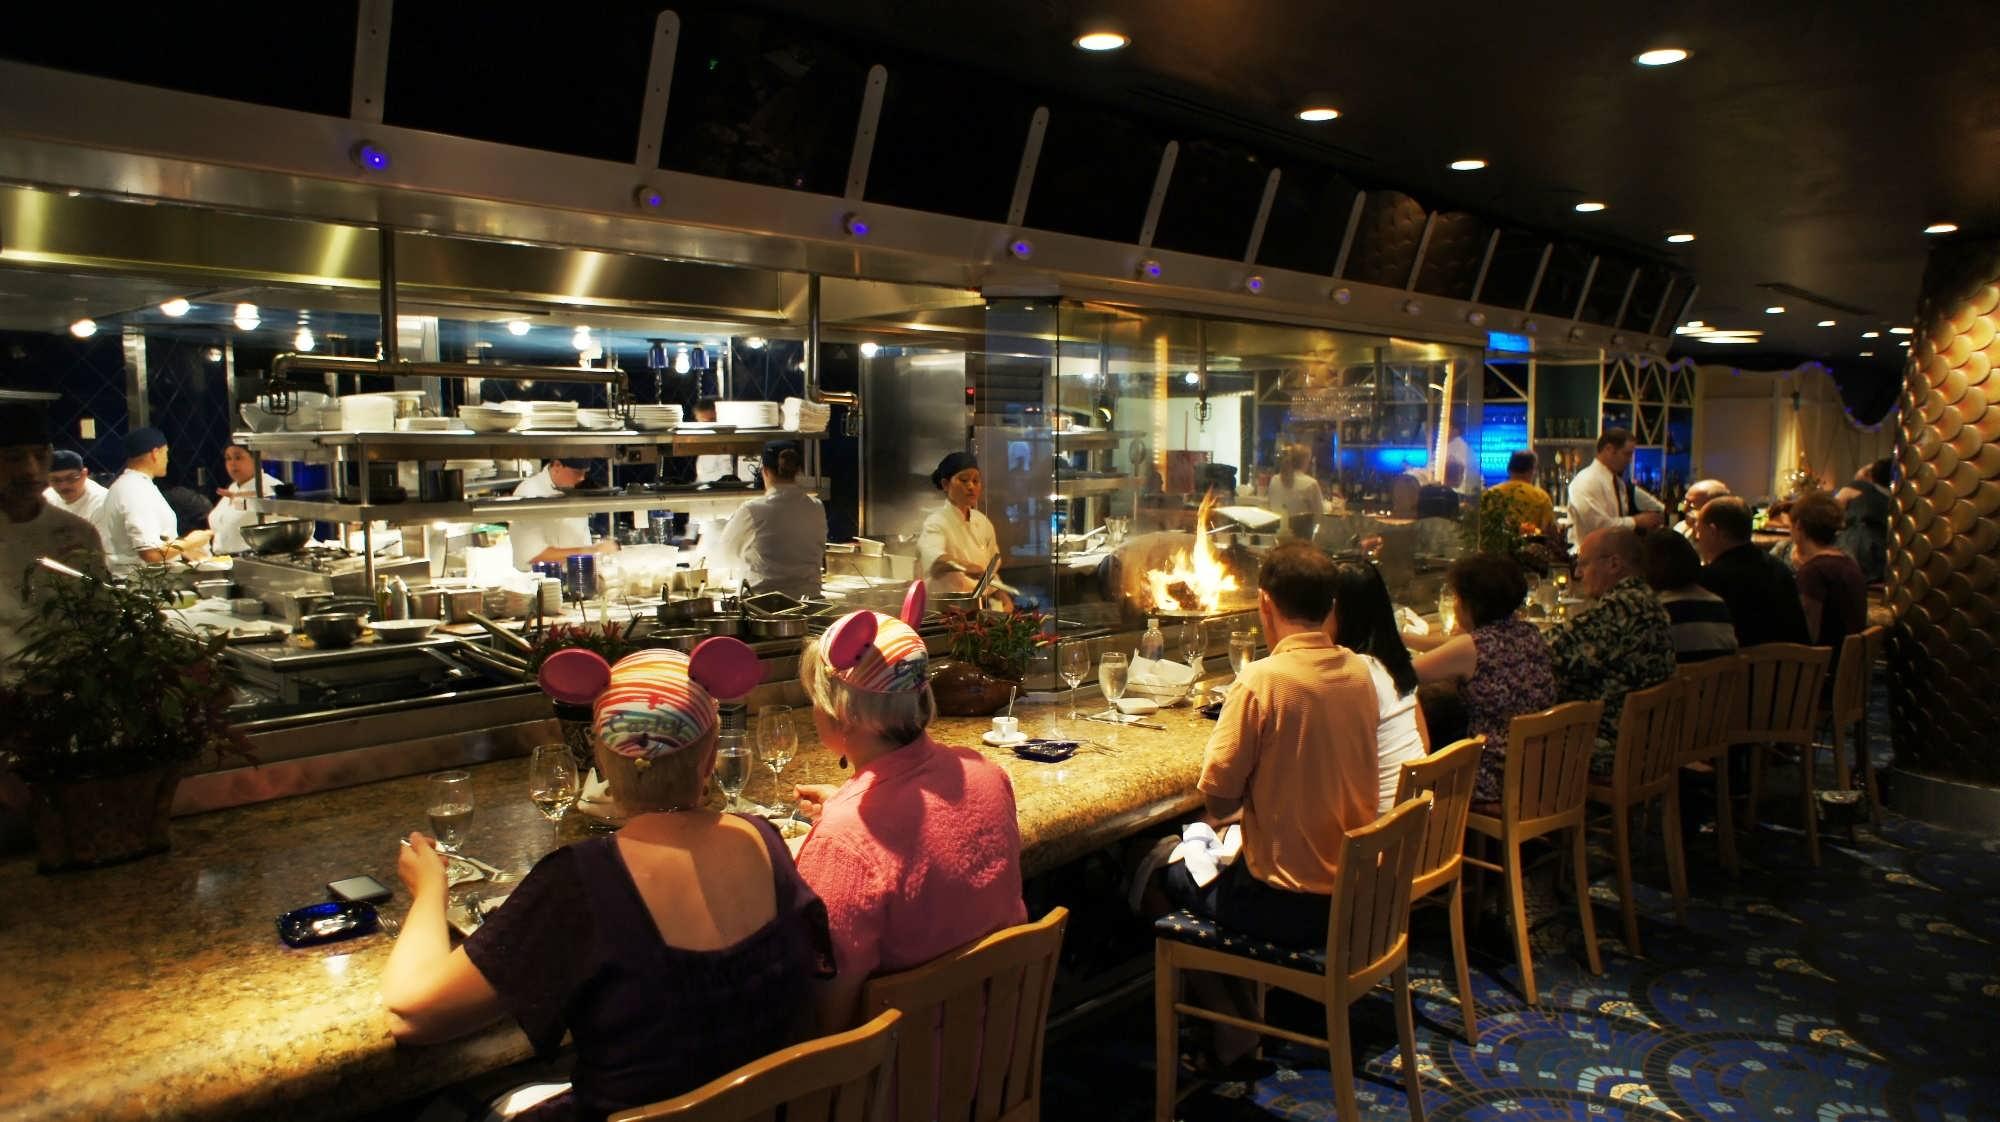 comparing restaurants essay